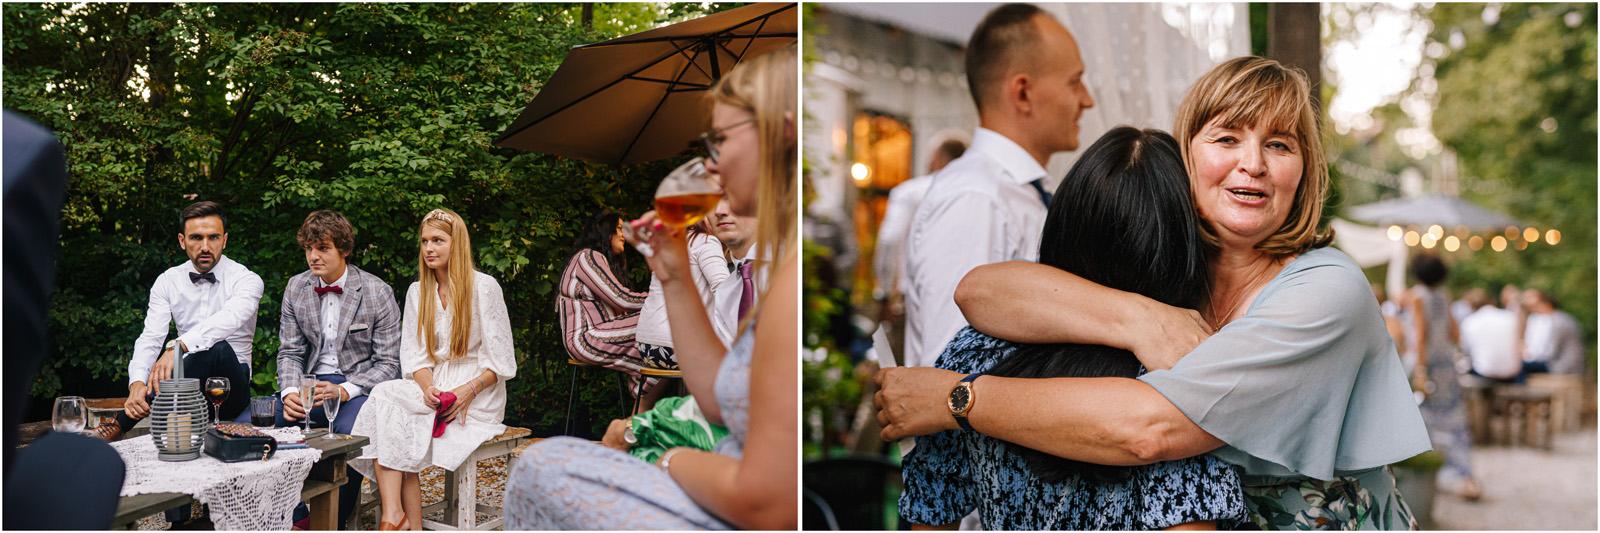 Ania & Mateusz | boho wesele w Stodole pod Kasztanami 100